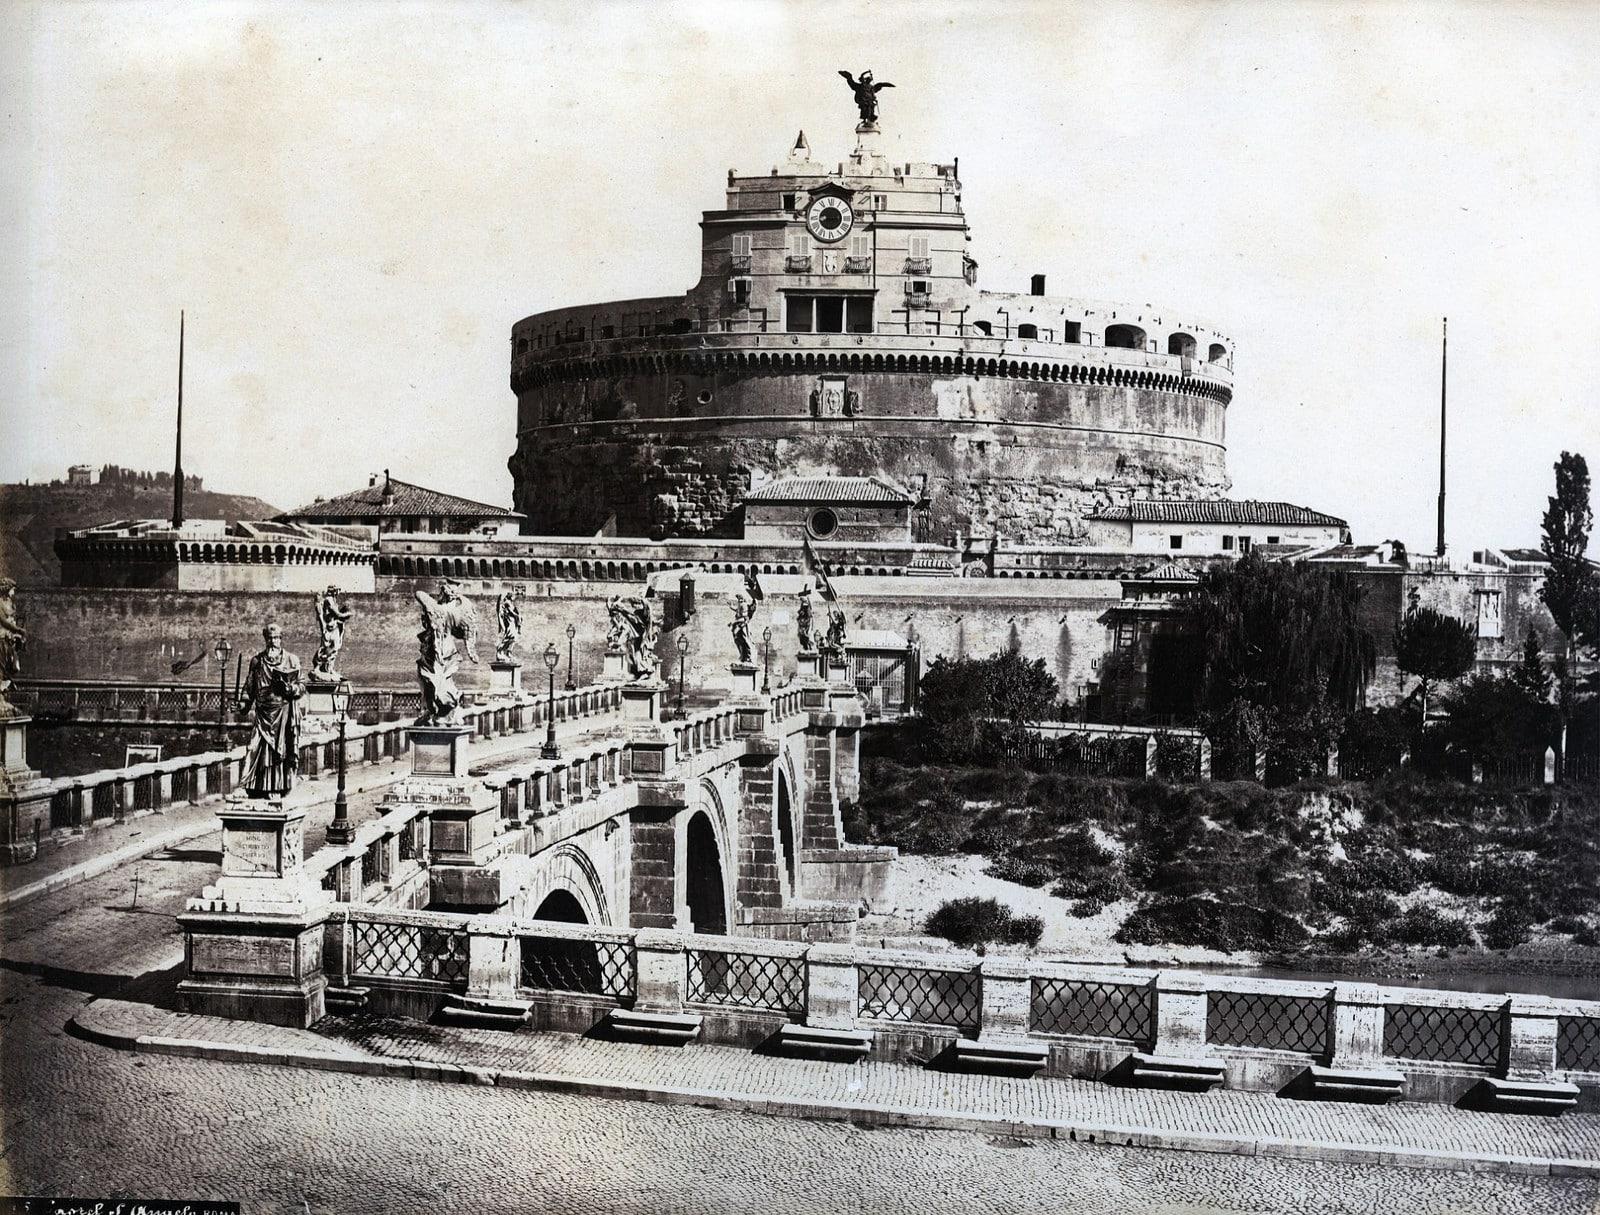 Giacchino Altobelli - Hadrian's Tomb, Rome, ca 1860